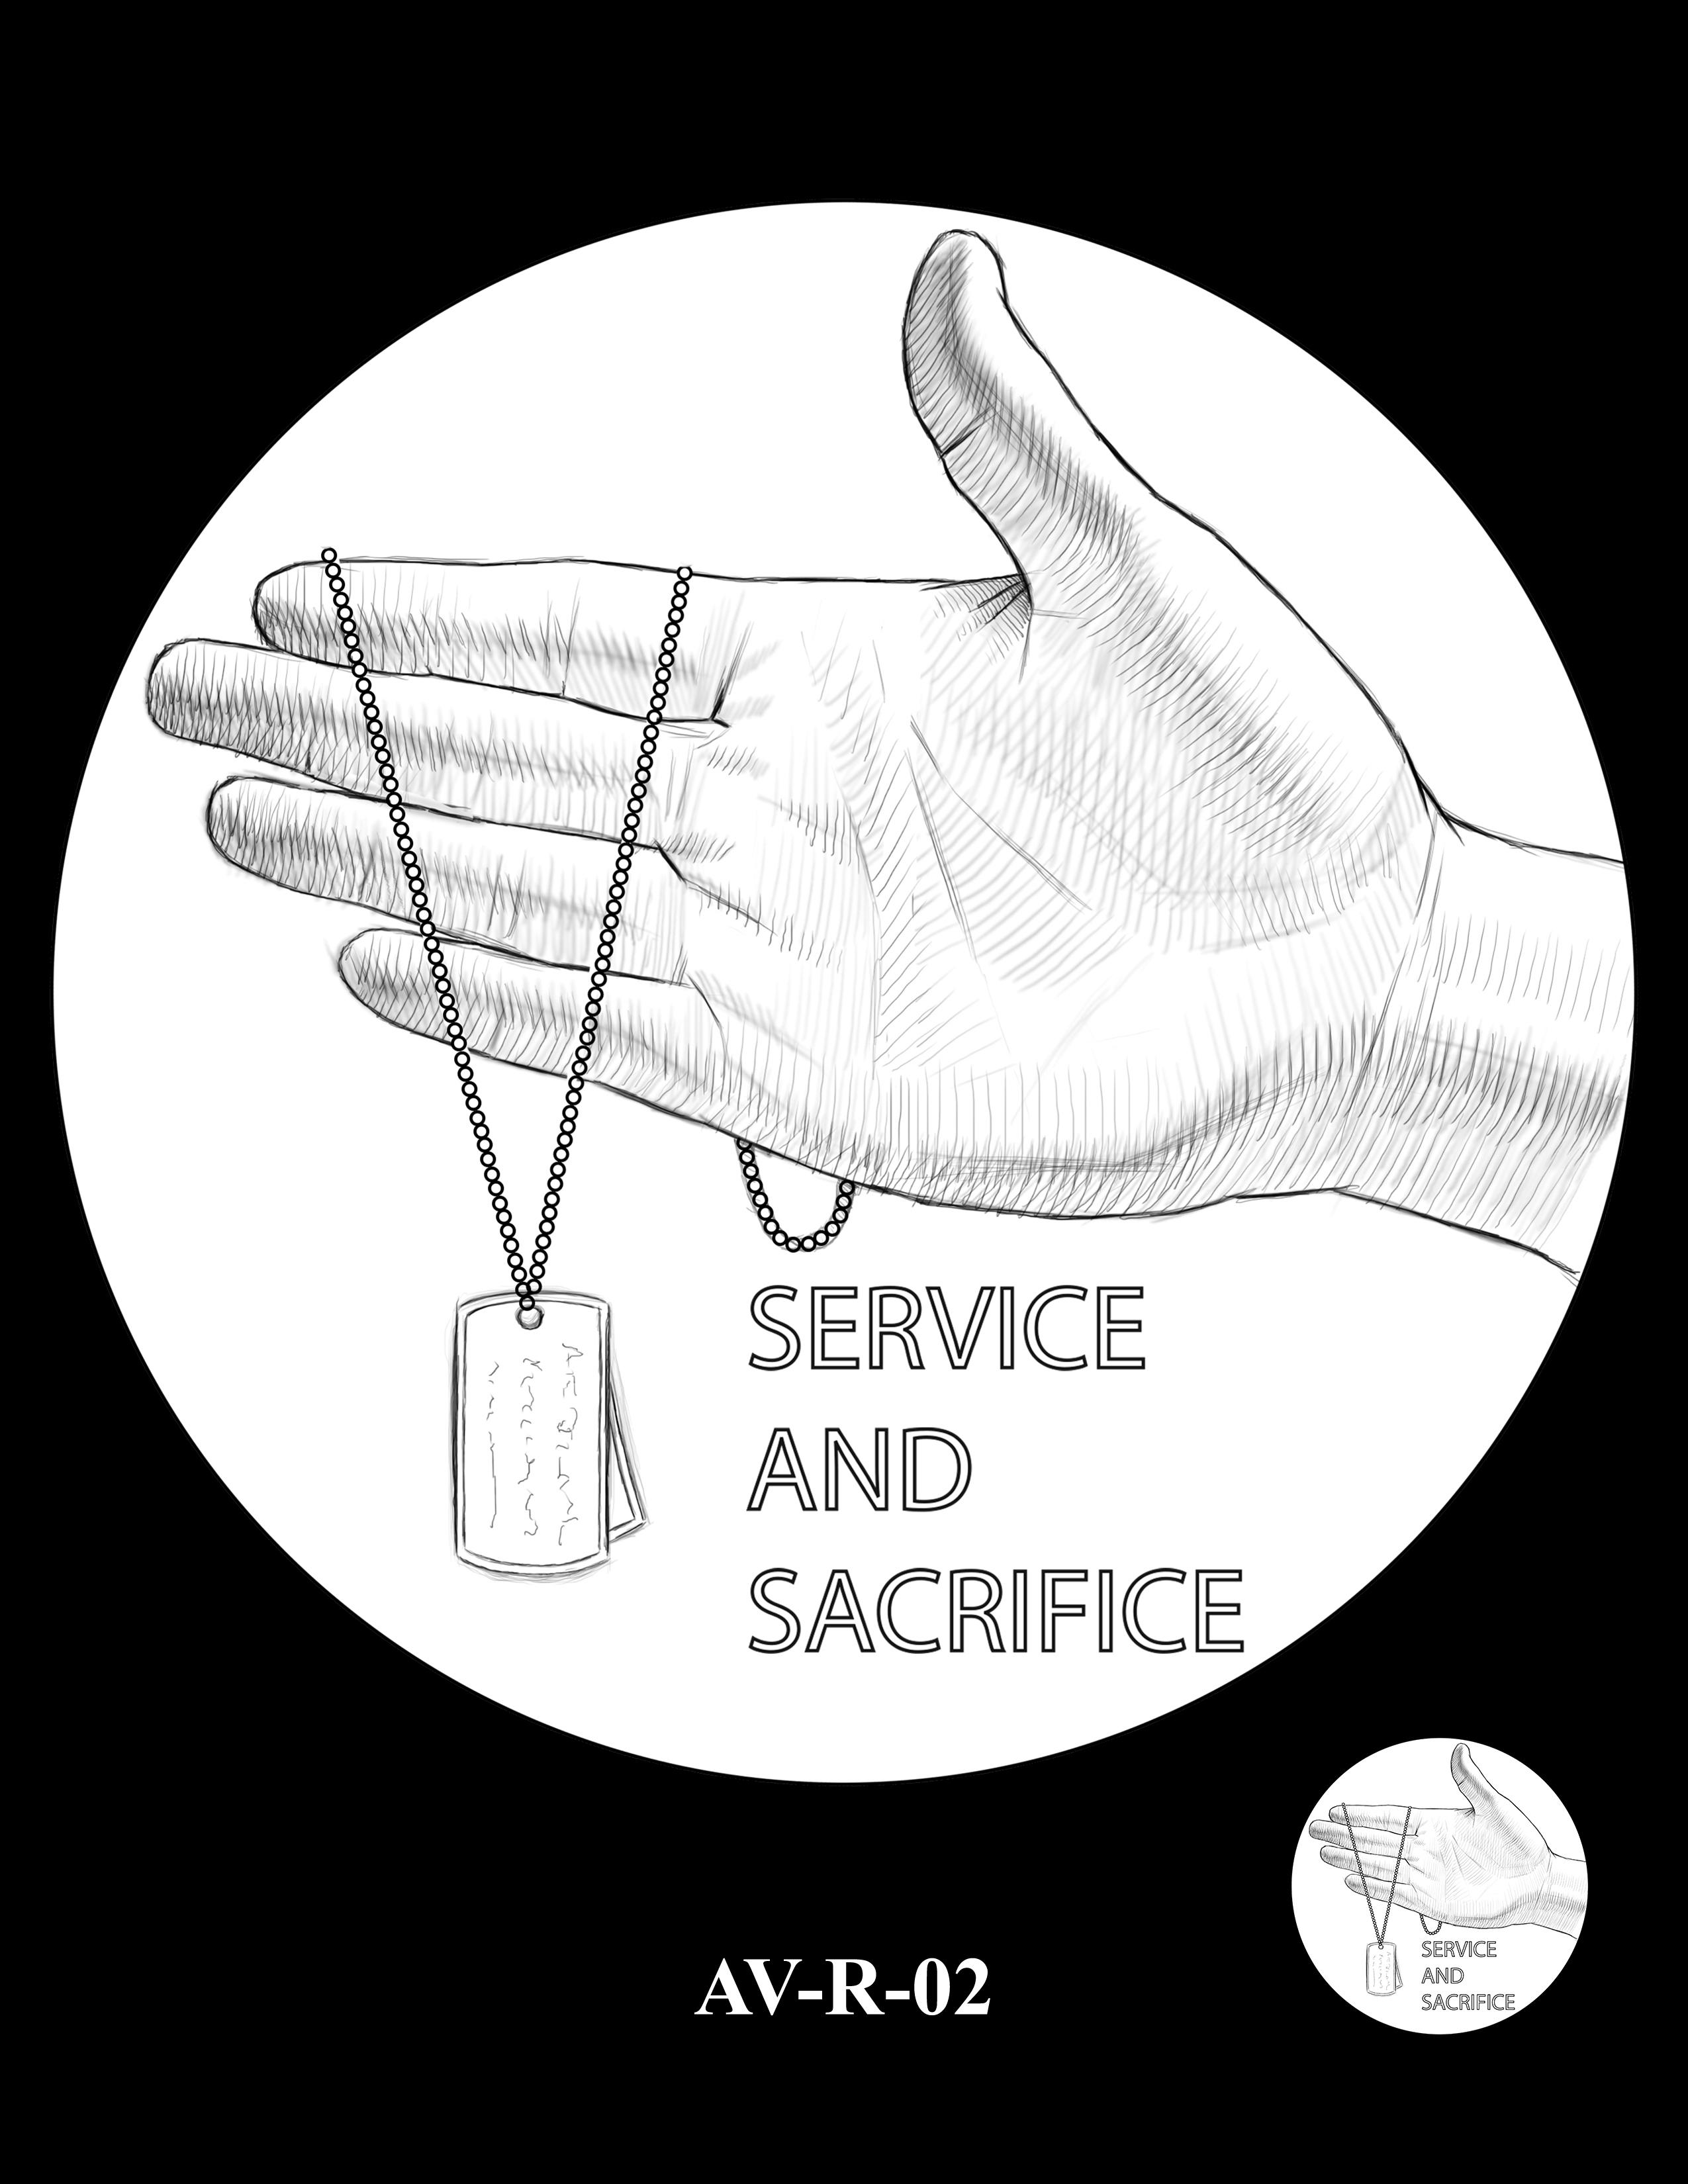 AV-R-02 - American Veterans Medal